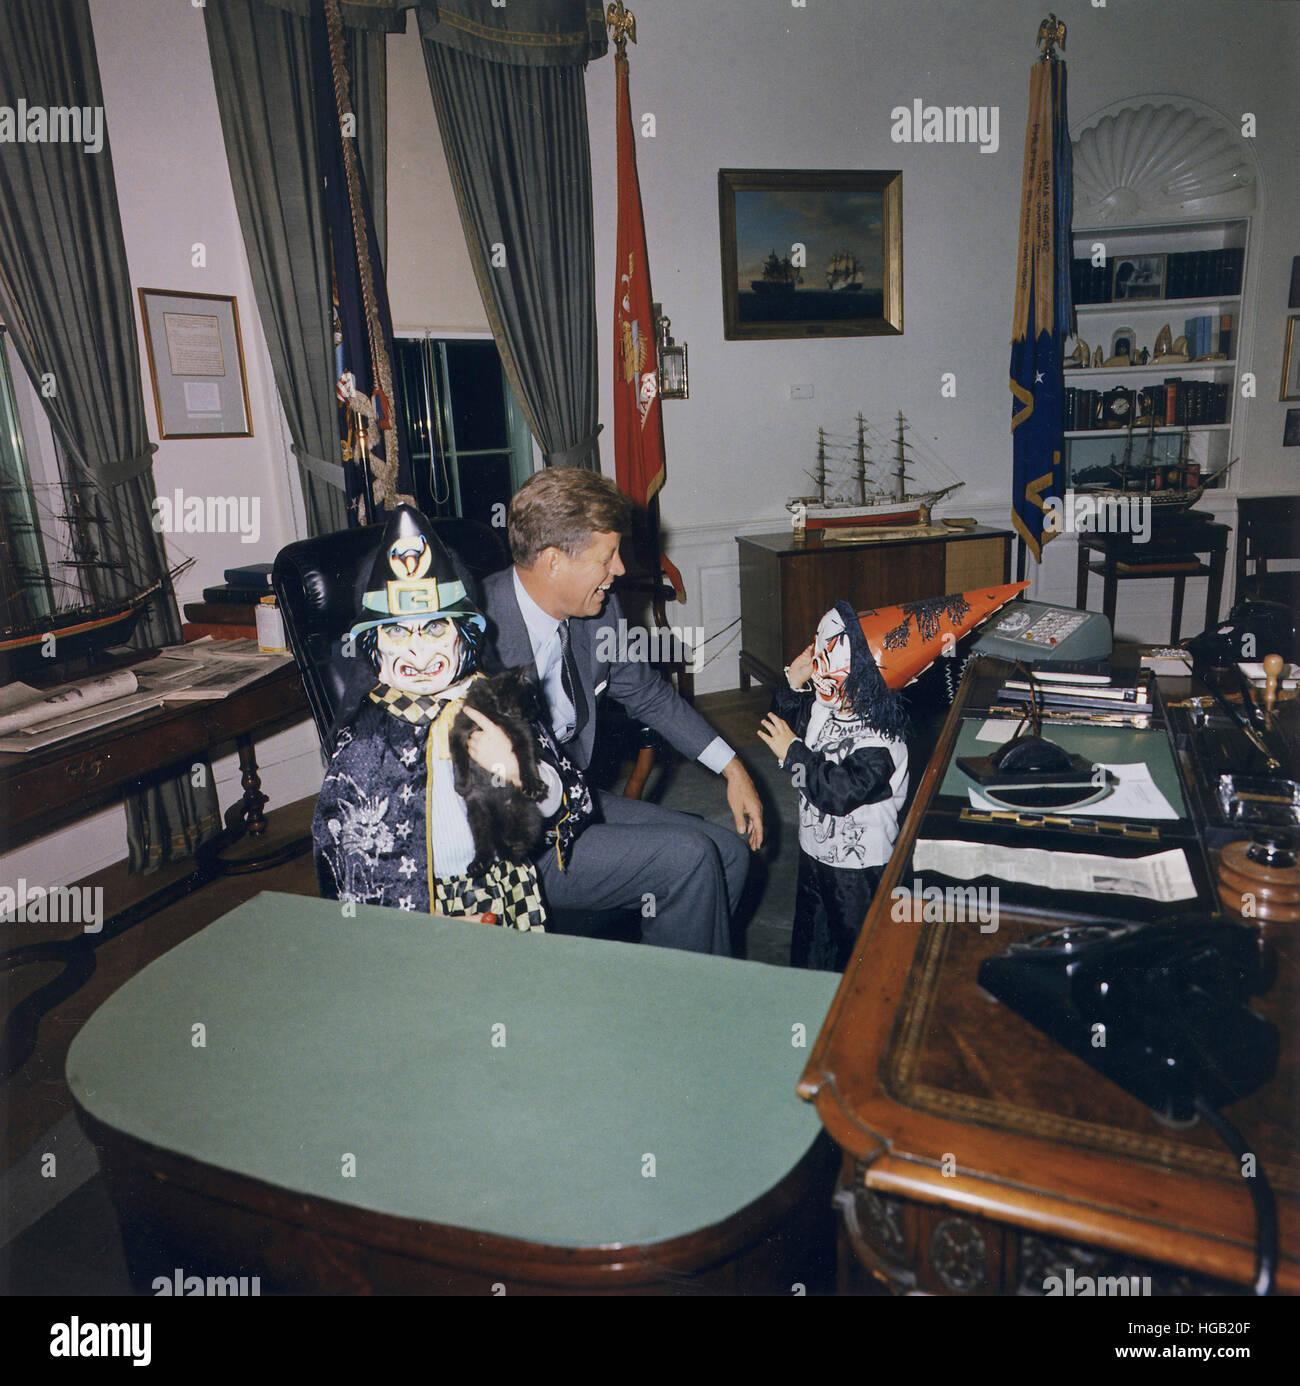 Halloween-Besucher an das Weiße Haus Oval Office. Stockbild